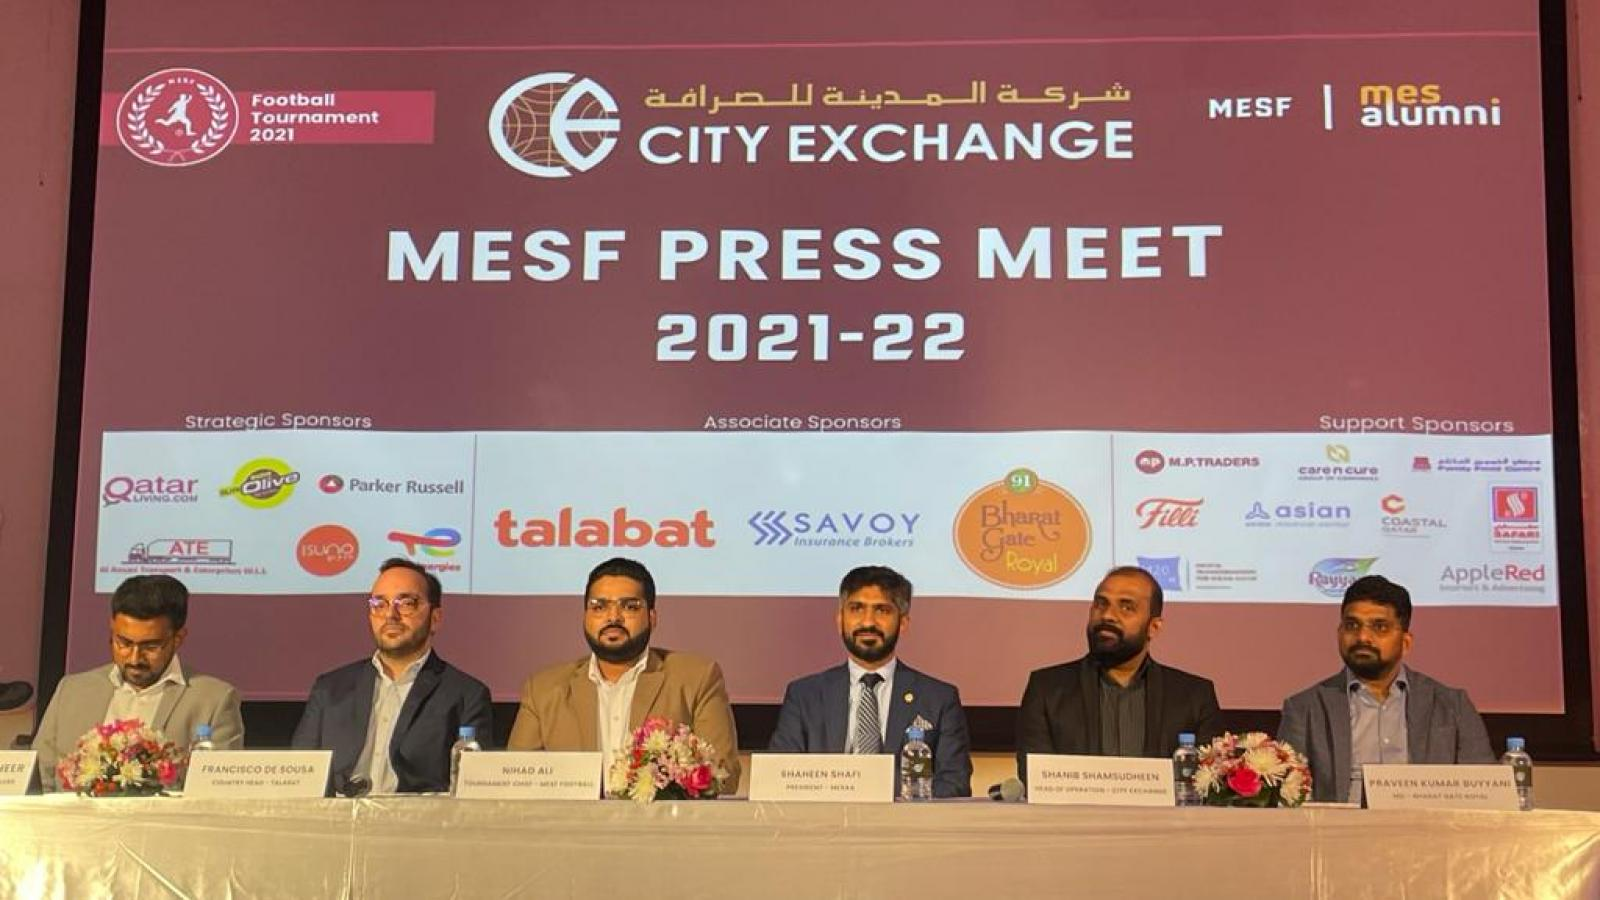 MES Alumni Association launches MESF Sports Festival 2021-22